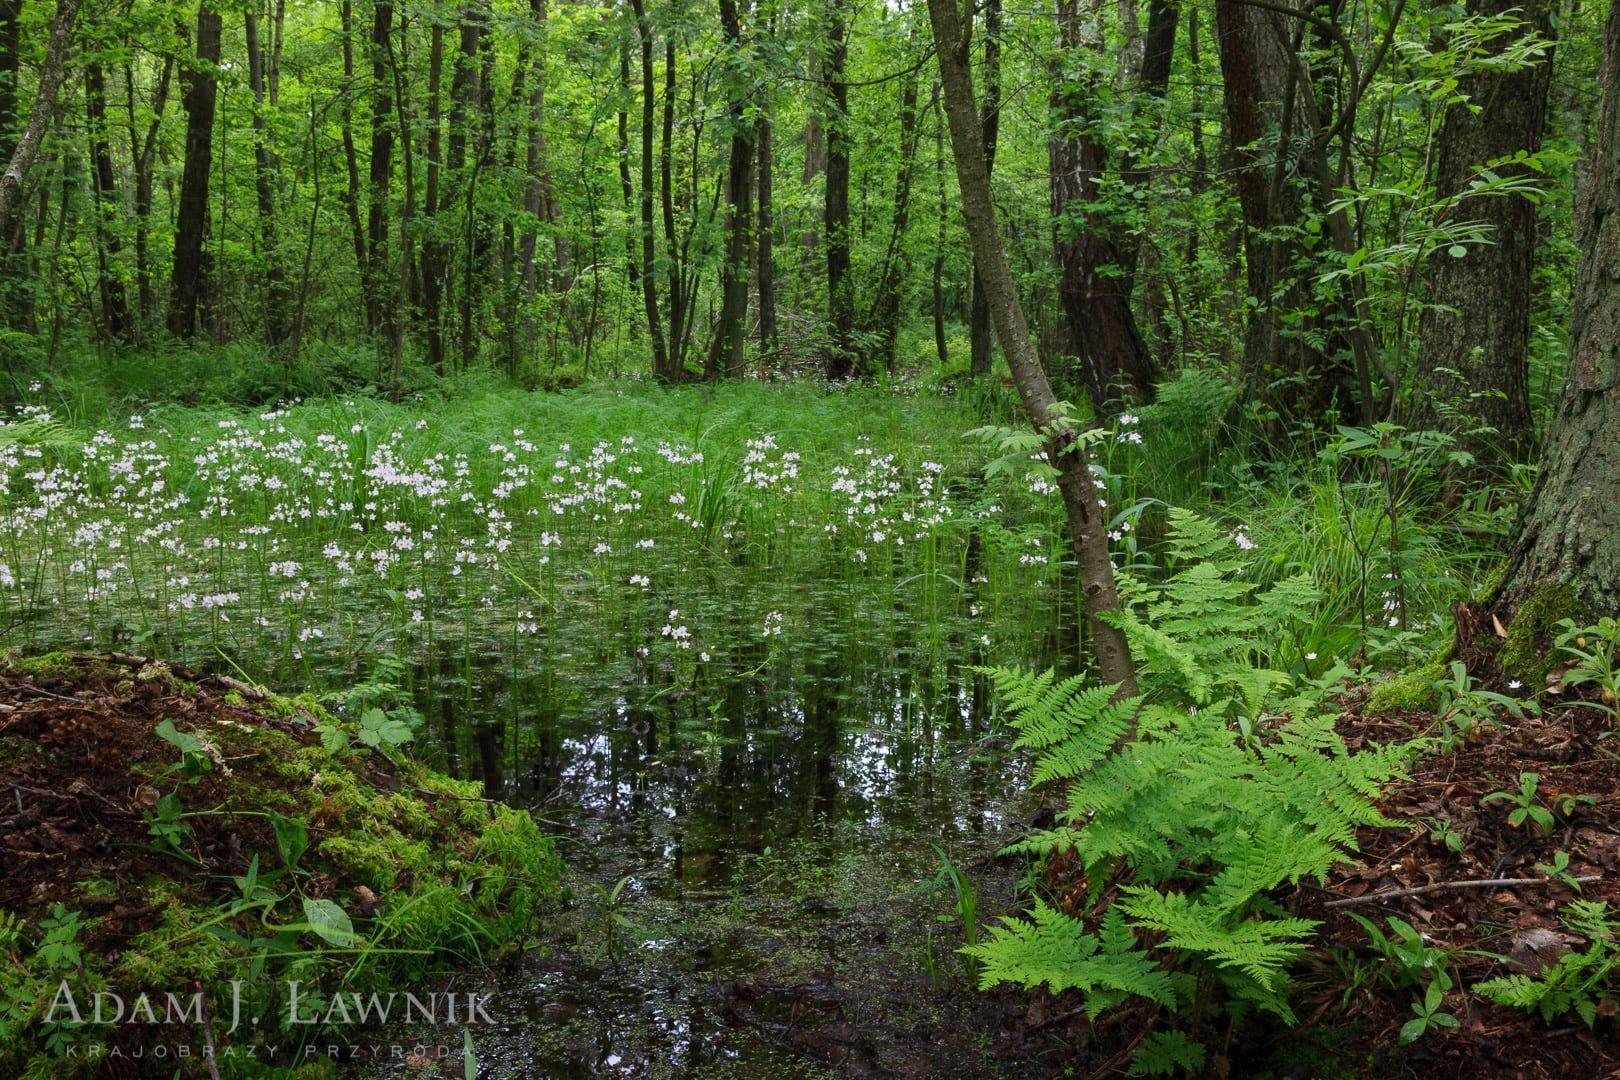 Polesie National Park, Poland 0805-00318C